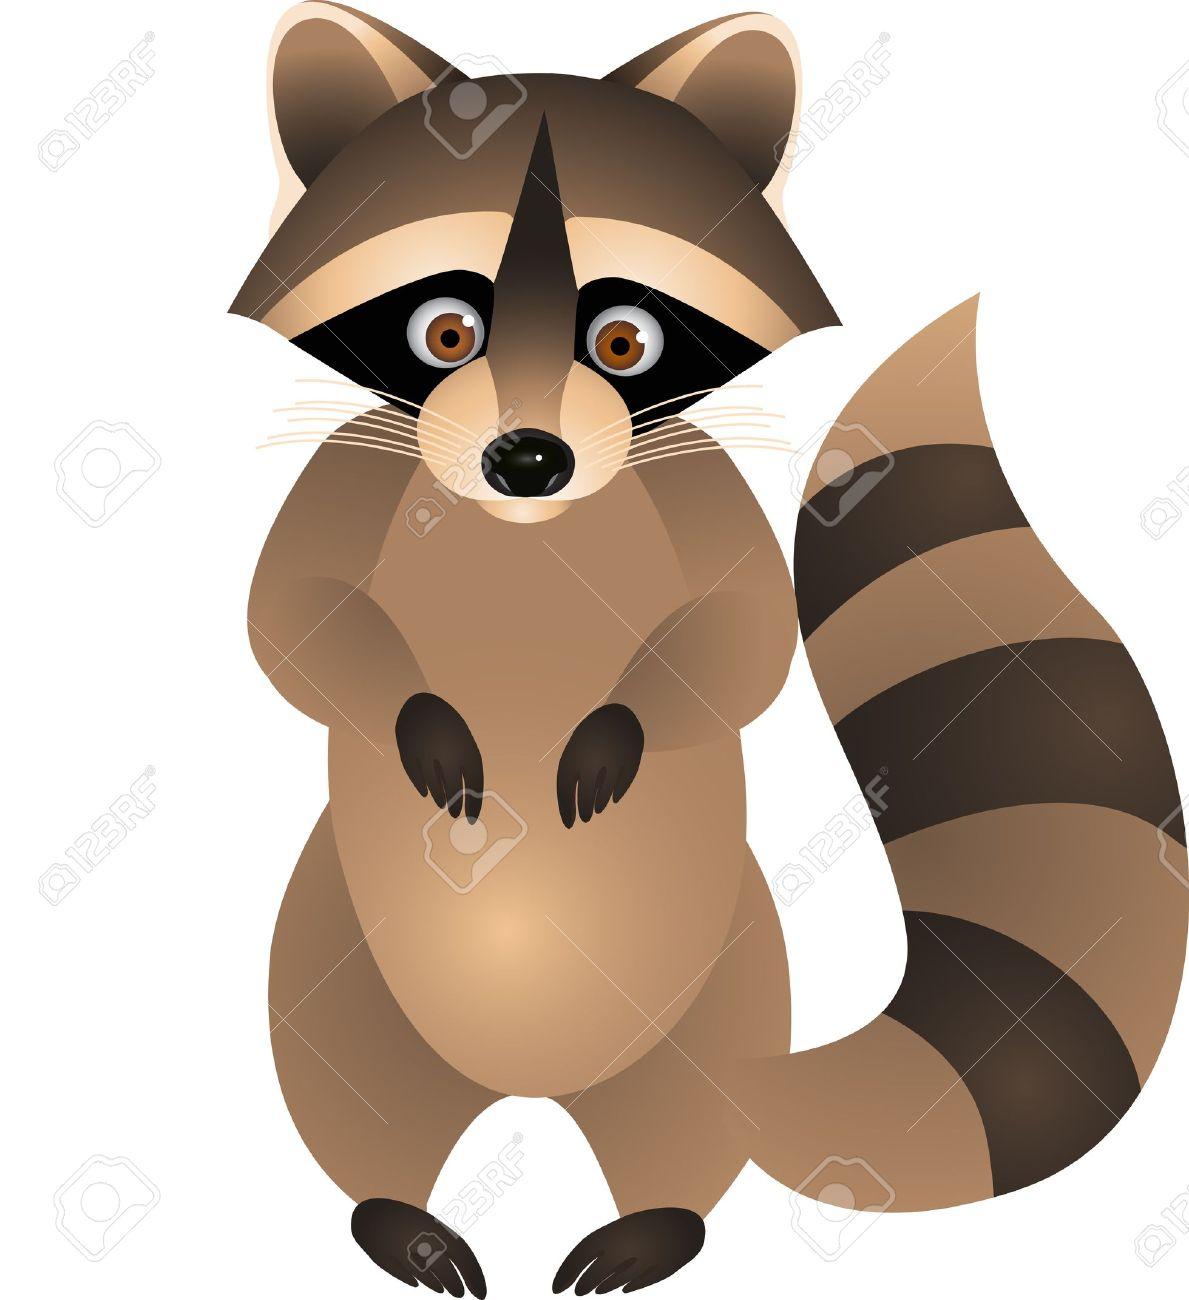 Raccoons clipart png download Raccoon Clipart | Clipart Panda - Free Clipart Images png download